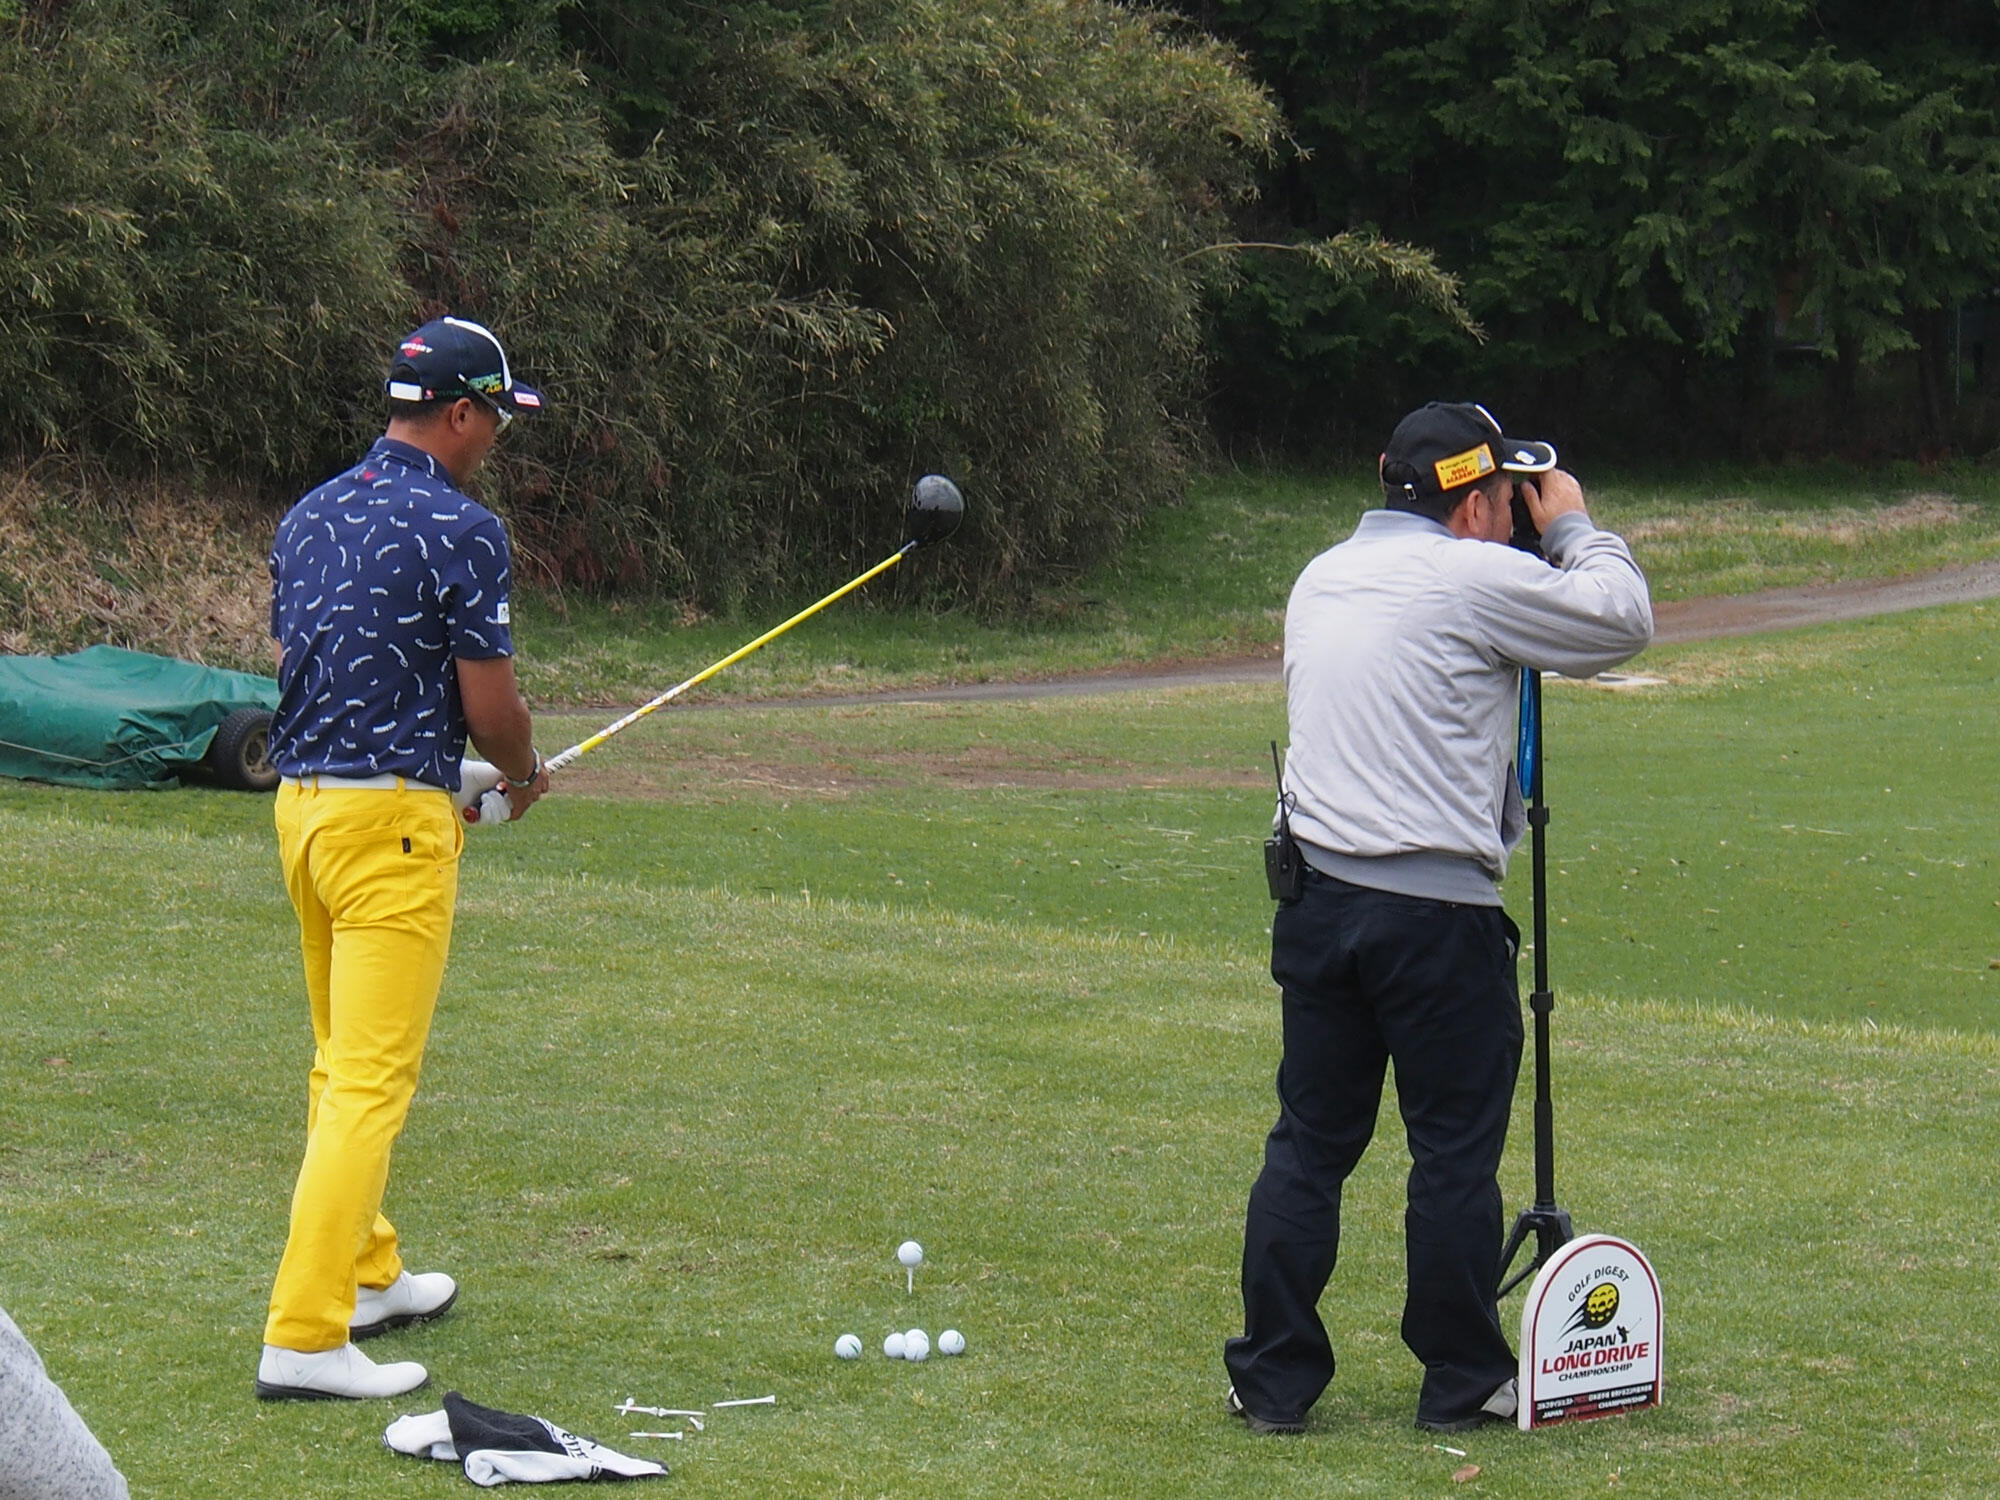 https://www.kenko-tokina.co.jp/mt-images/golfjapan1.jpg